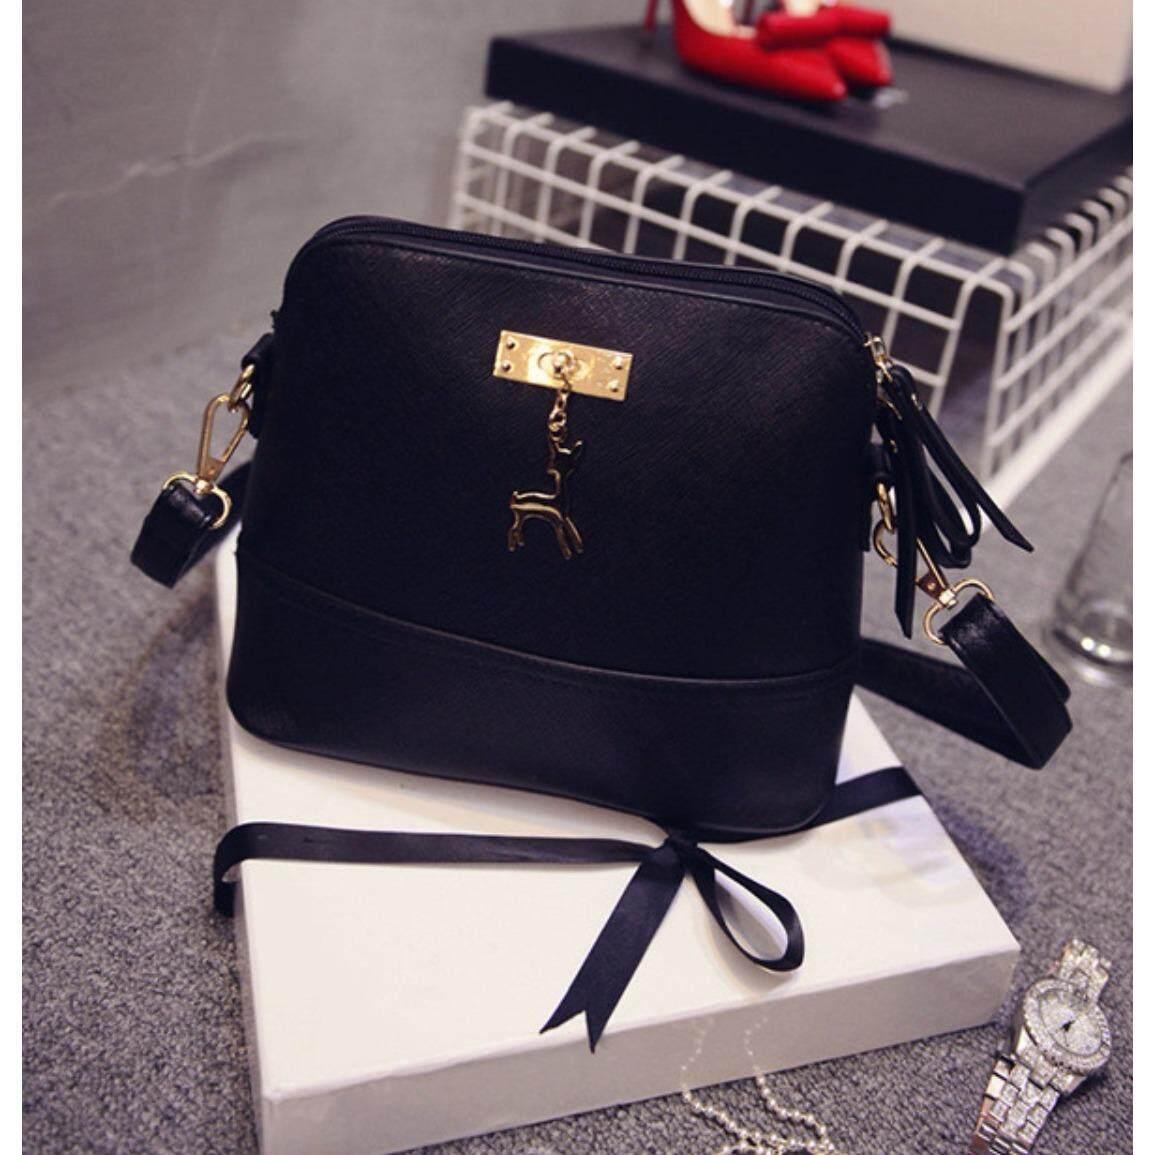 Women Clutches Buy At Best Price In Malaysia Www Tas Lacoste Zip Basic Special Colours Elina Handbag Wanita Curvy Crossbody Des100